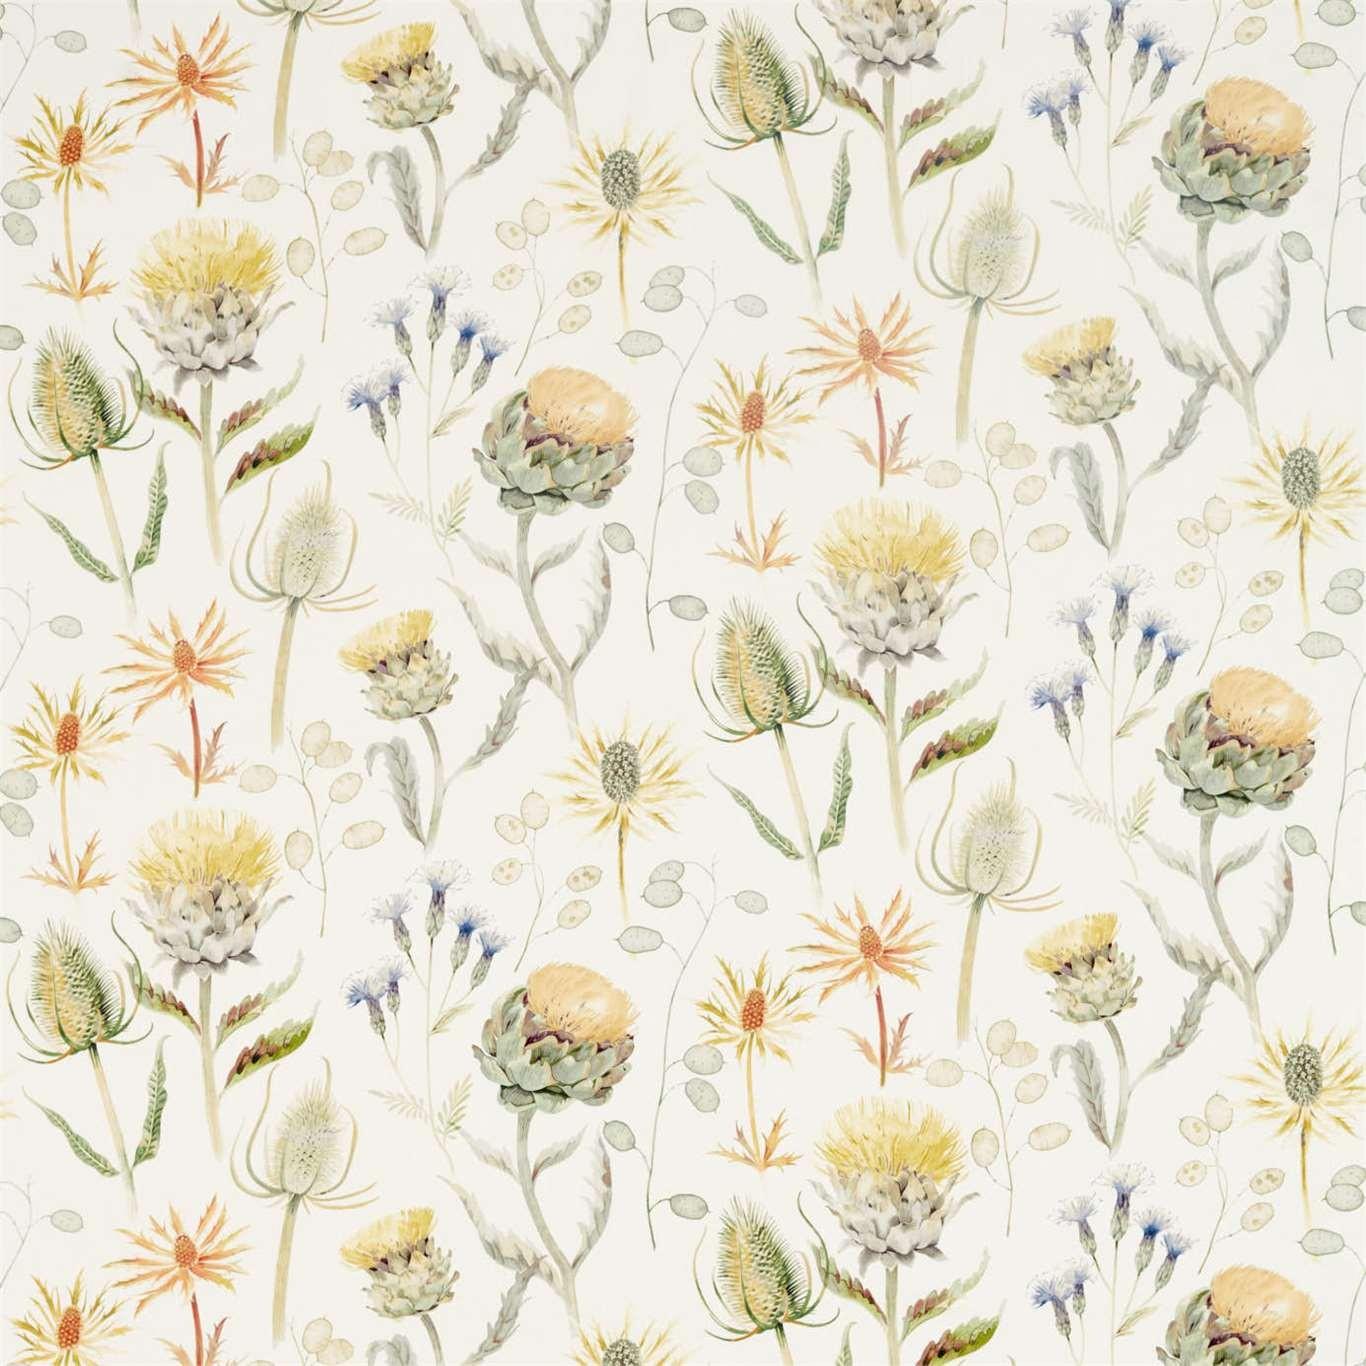 Sanderson Thistle Garden 226422 Fabric Ochre Olive